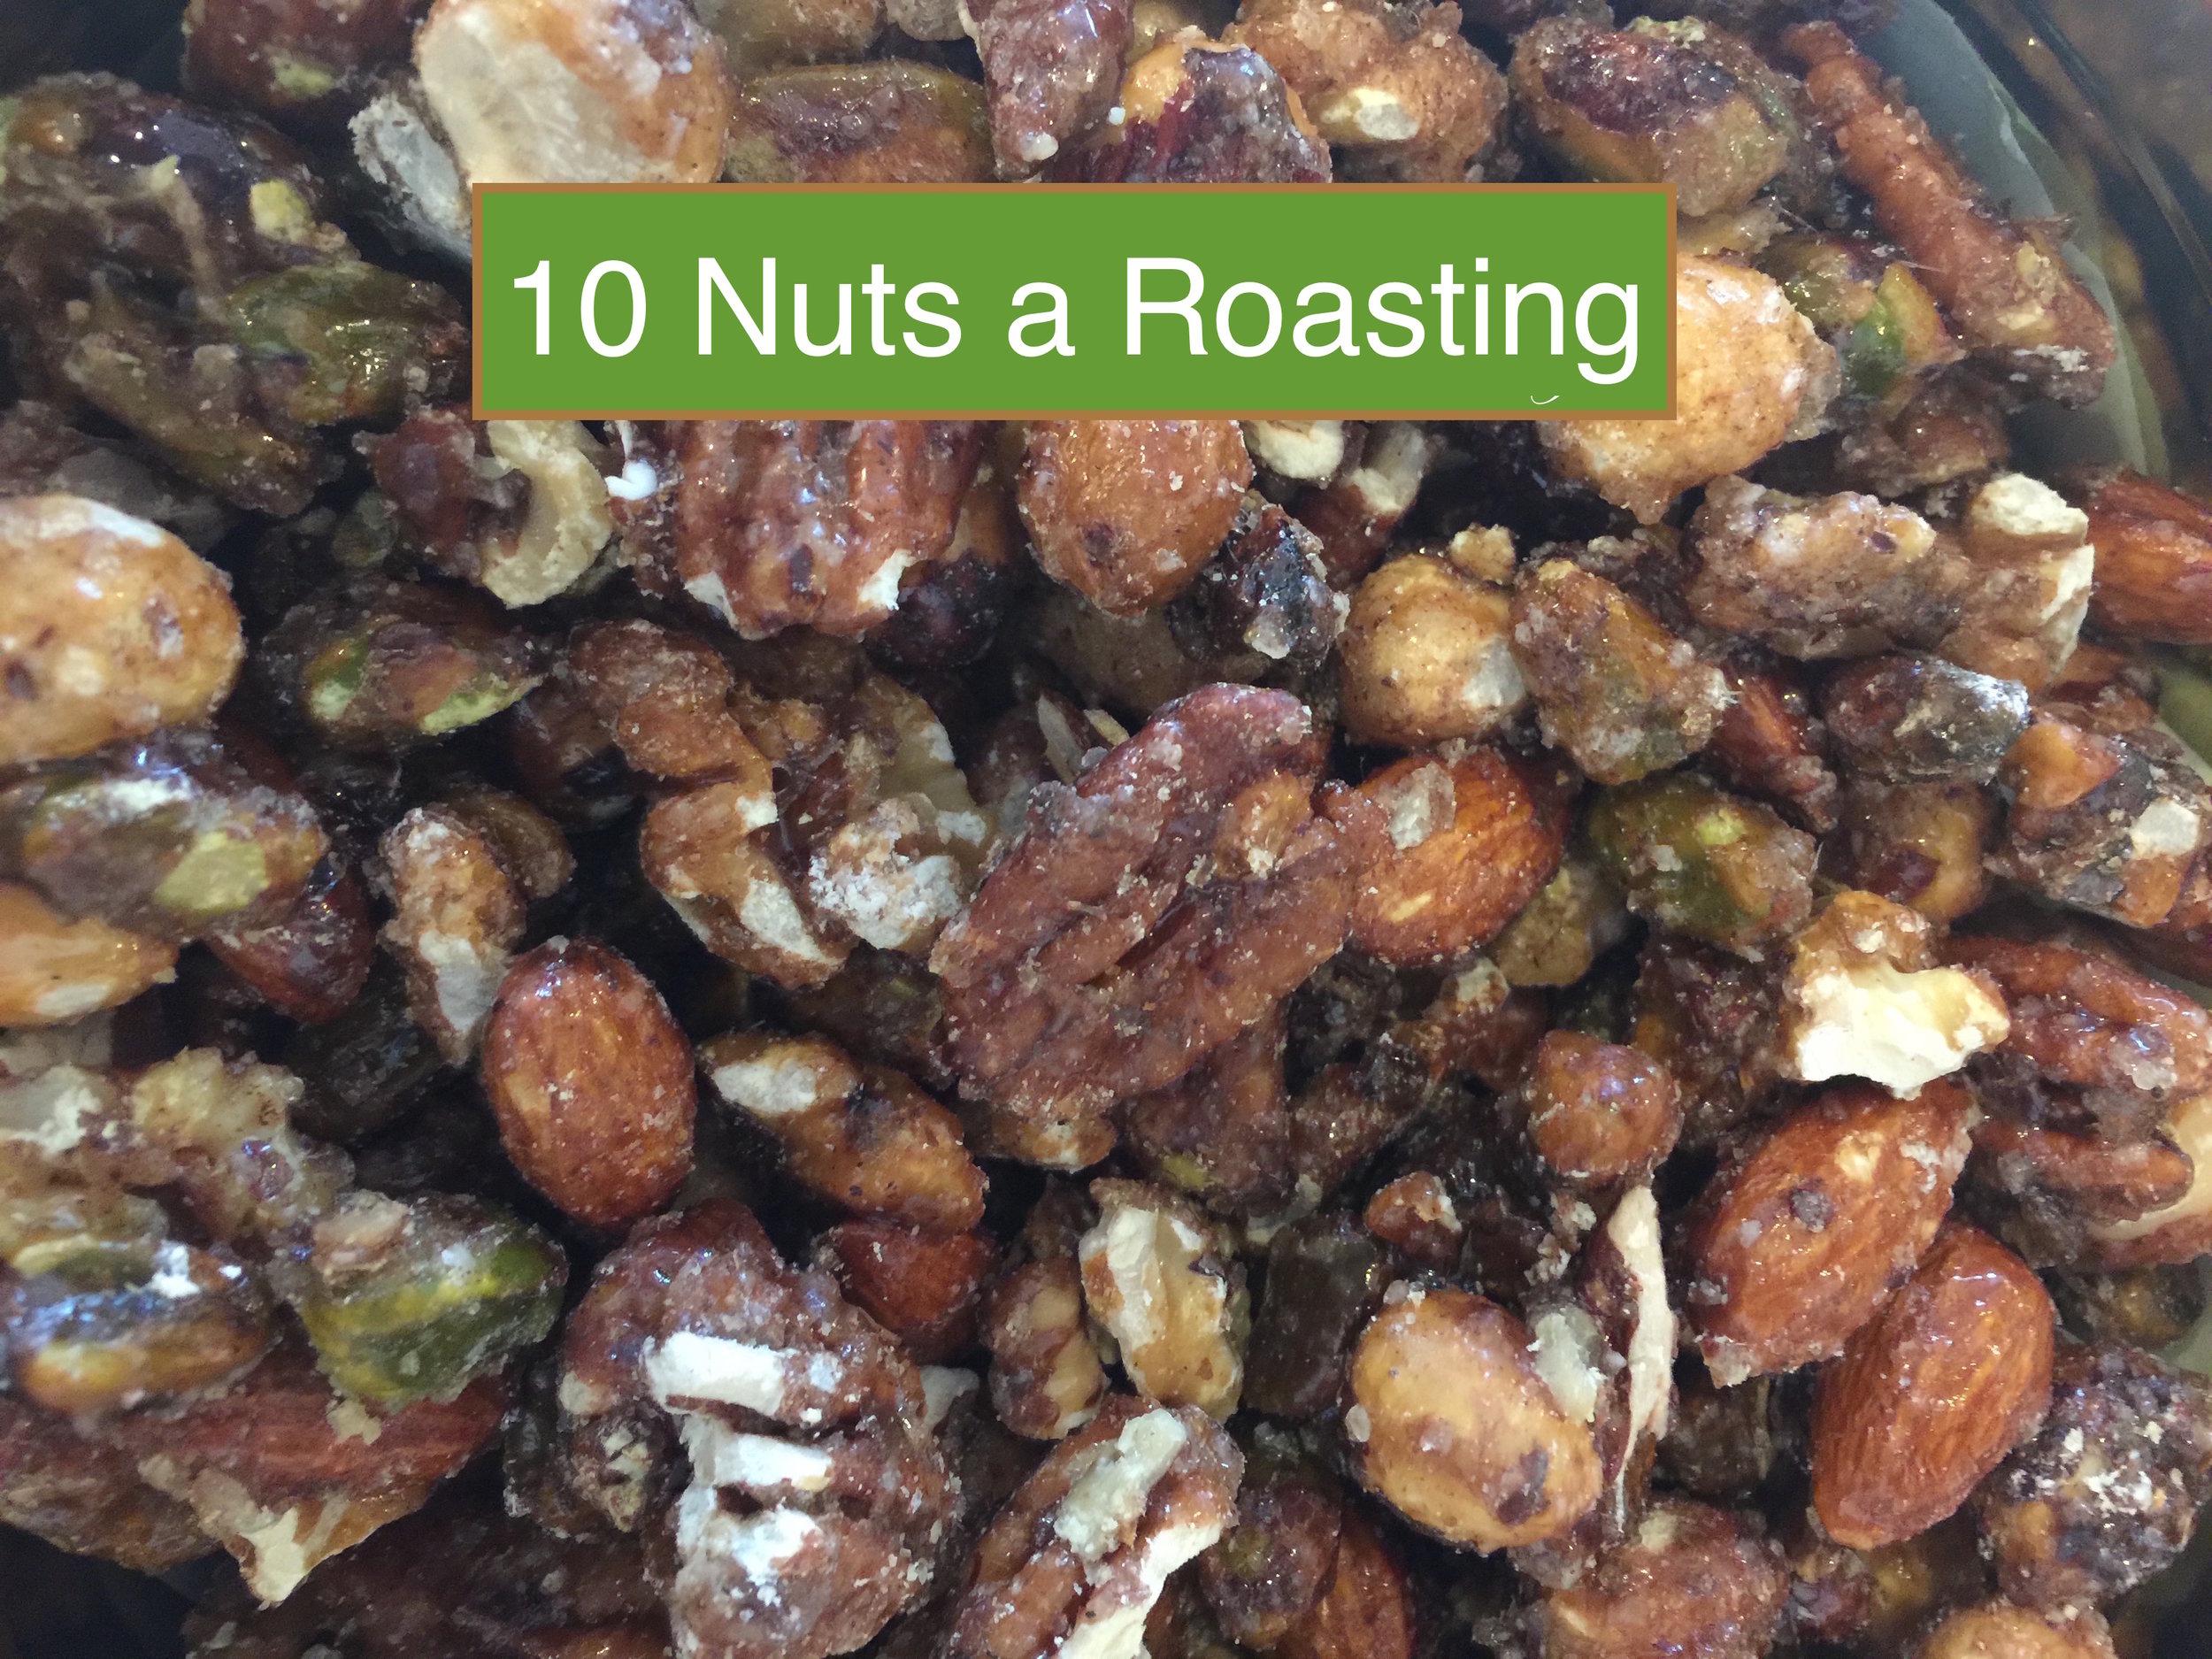 10 Nuts a Roasting.JPG